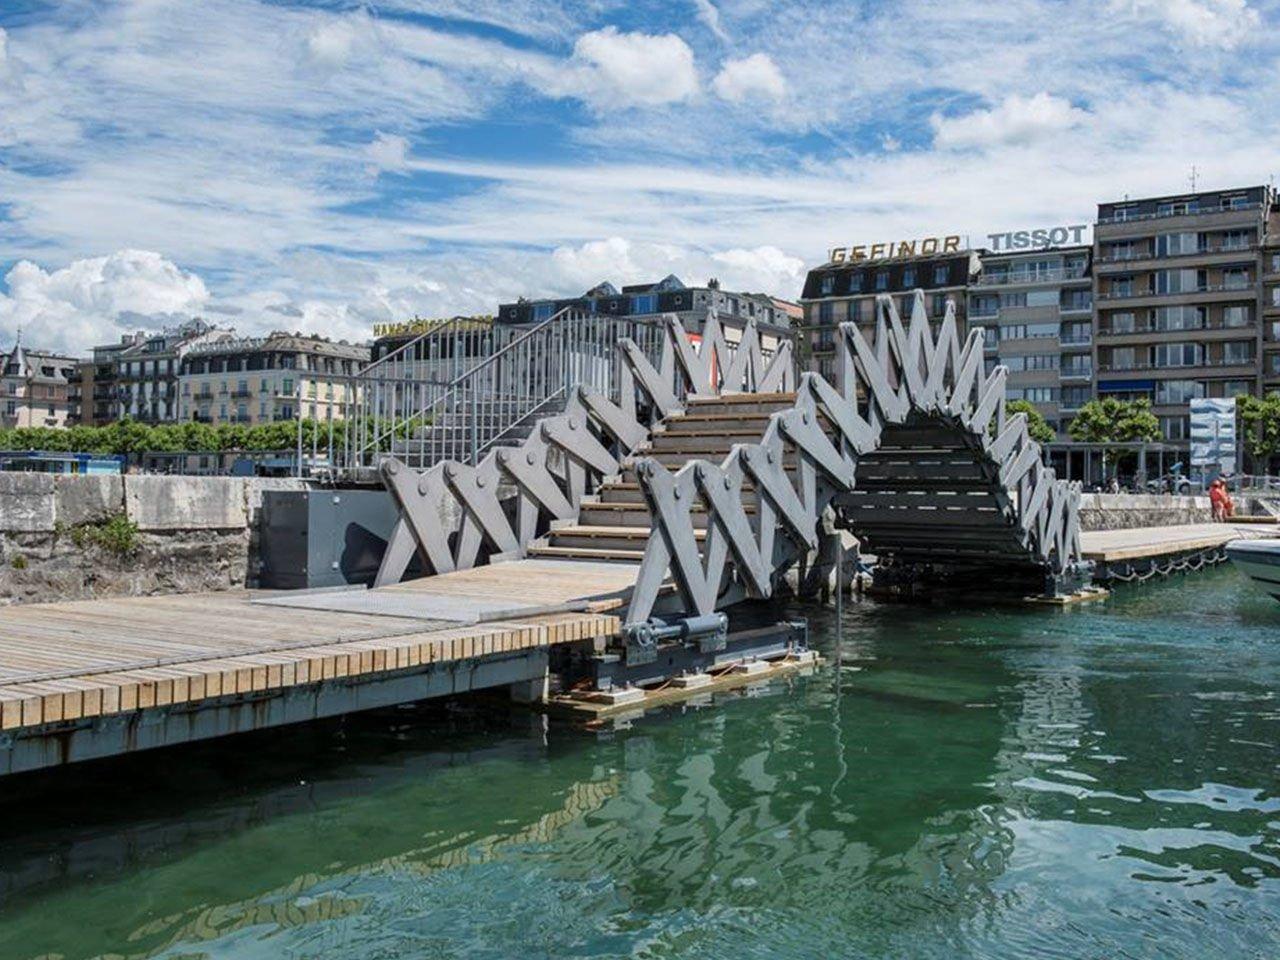 The Ripple Bridge at Lake Geneva